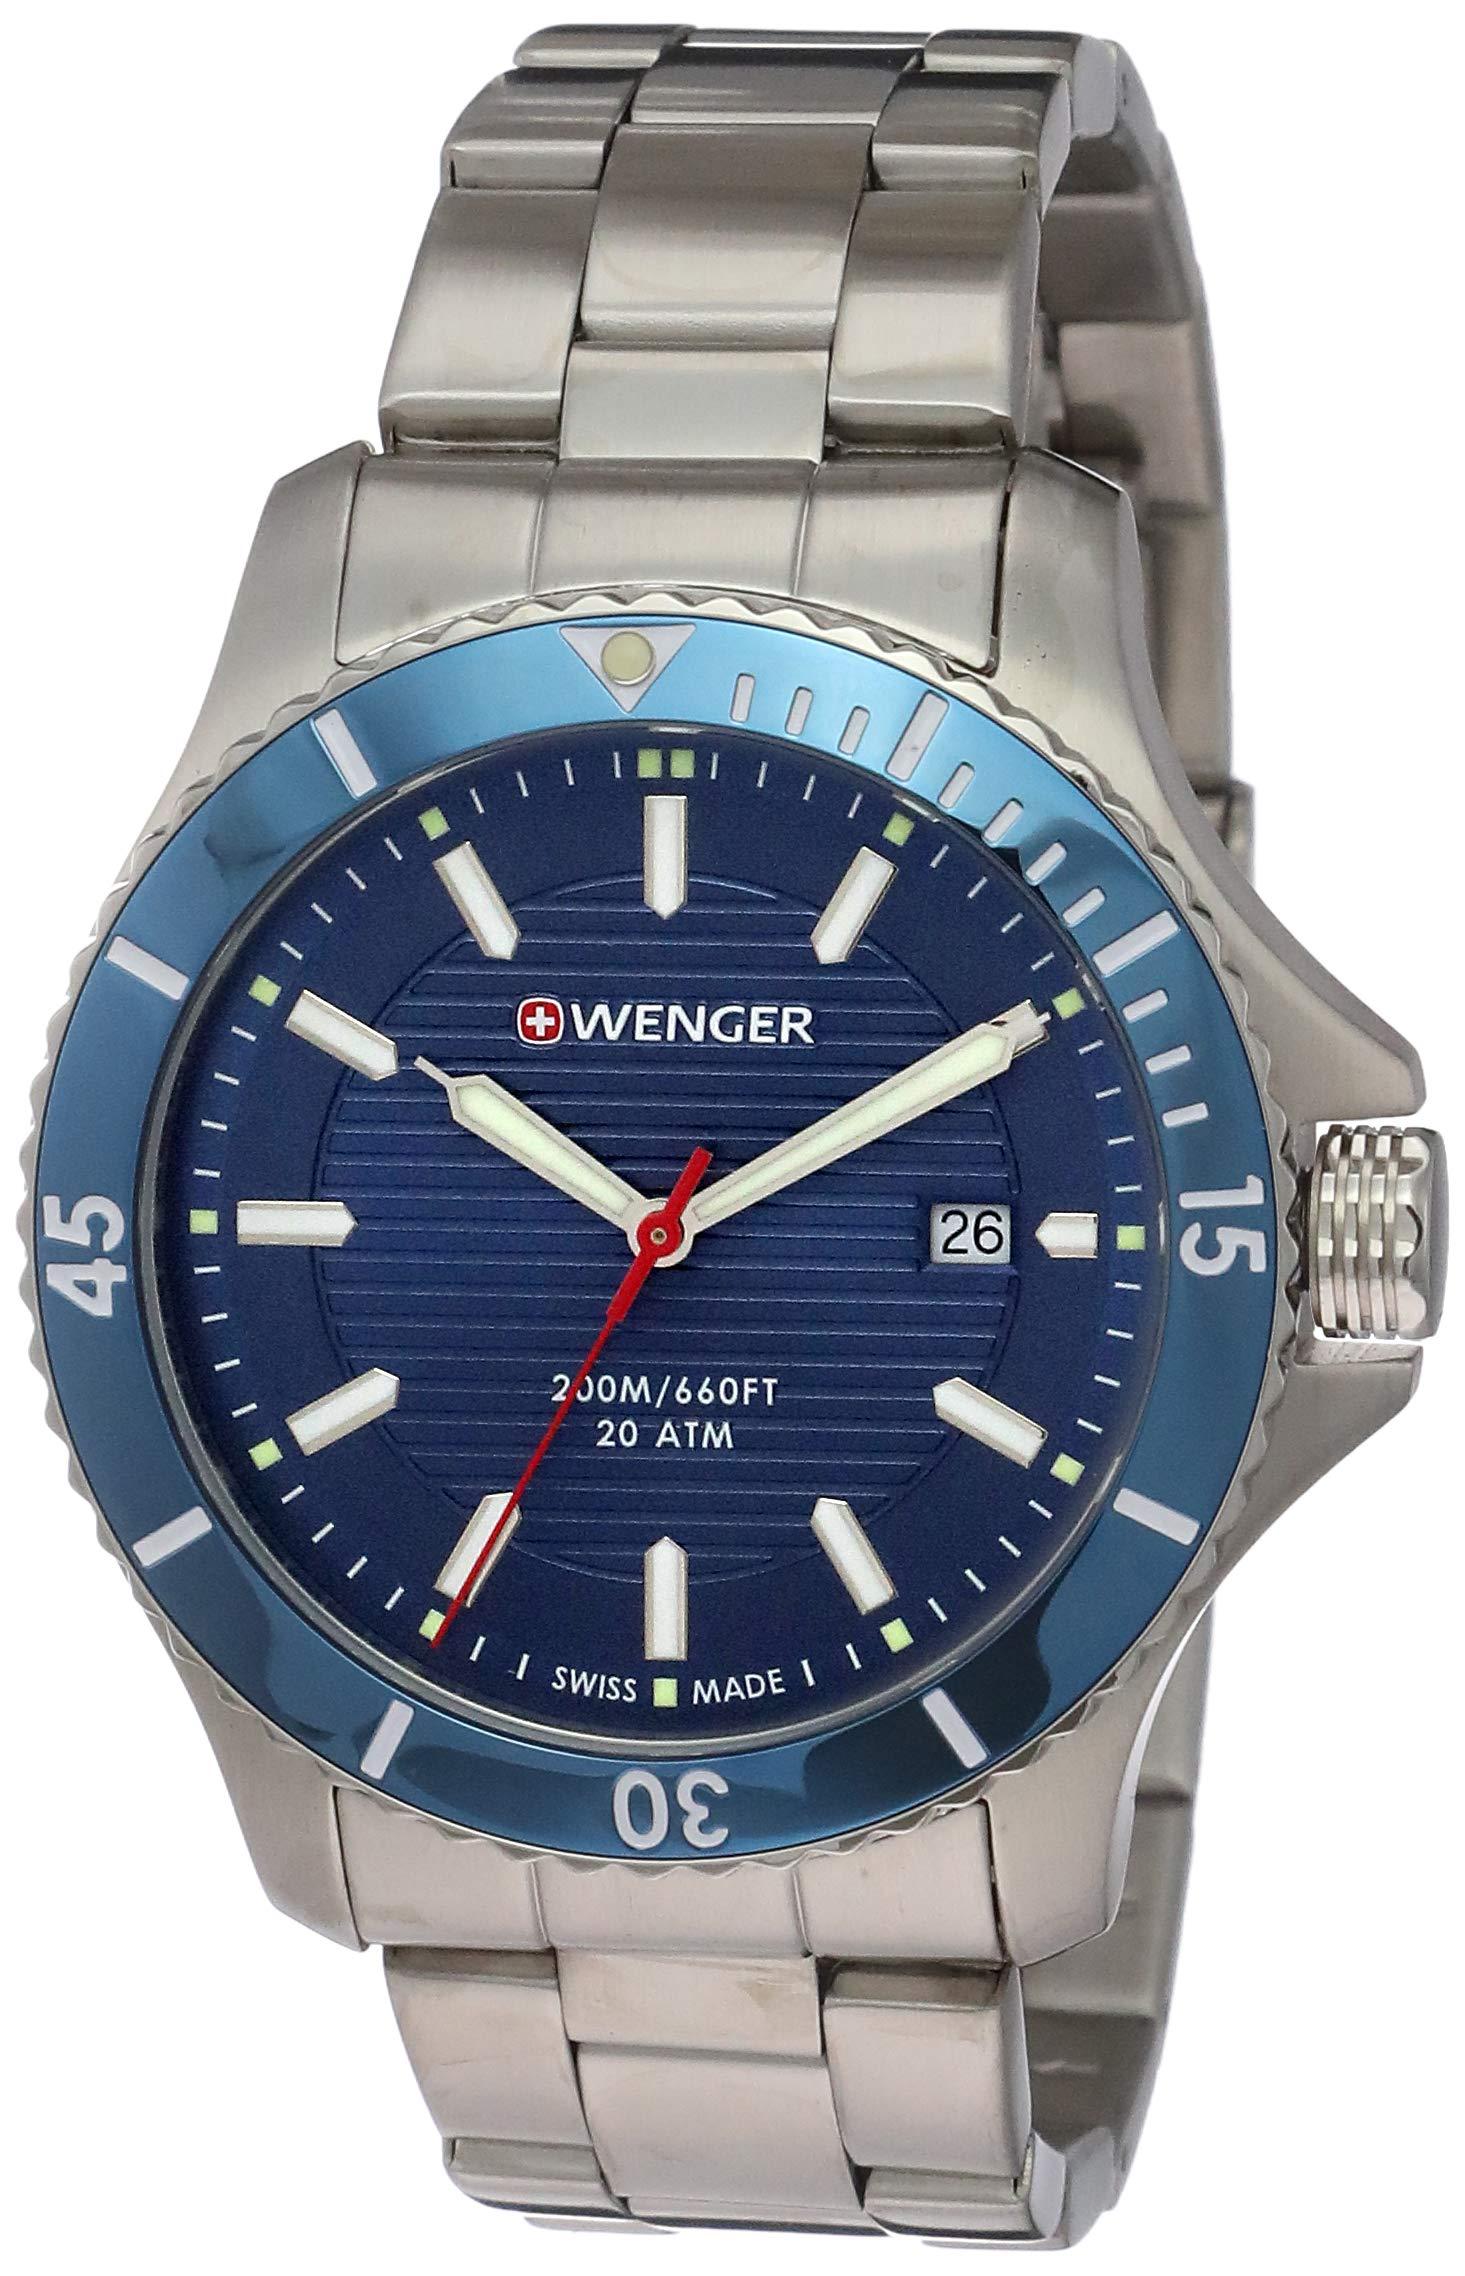 Wegner Unisex Analogue Quartz Watch with Stainless Steel Strap 01.0641.120